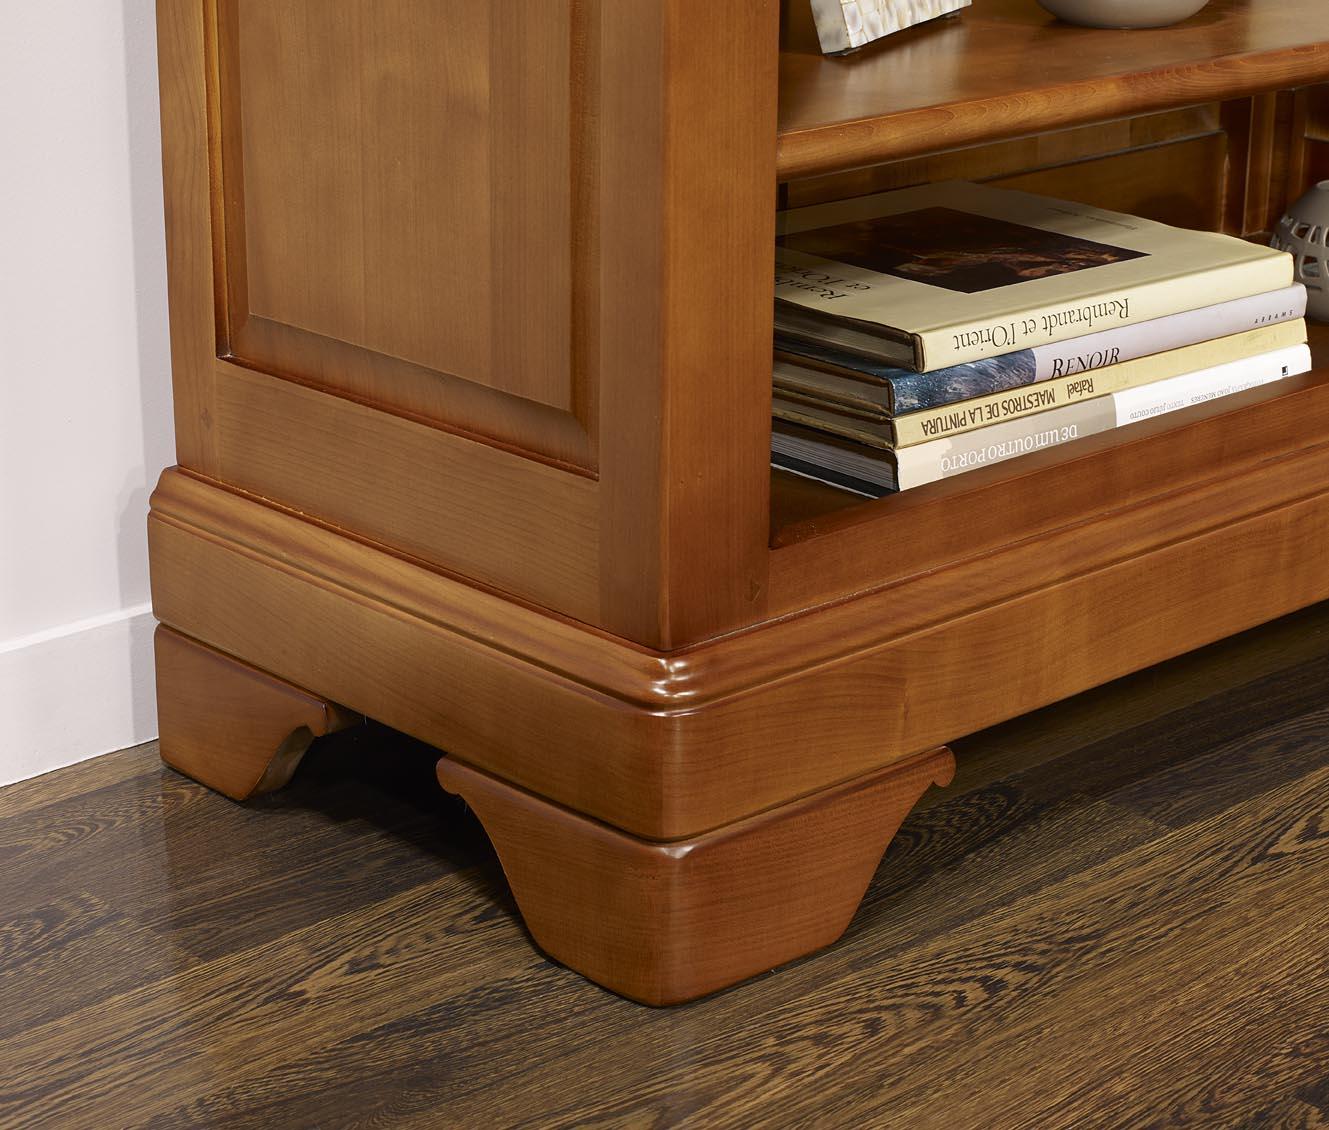 bibus val rie en merisier massif de style louis philippe meuble en merisier massif. Black Bedroom Furniture Sets. Home Design Ideas